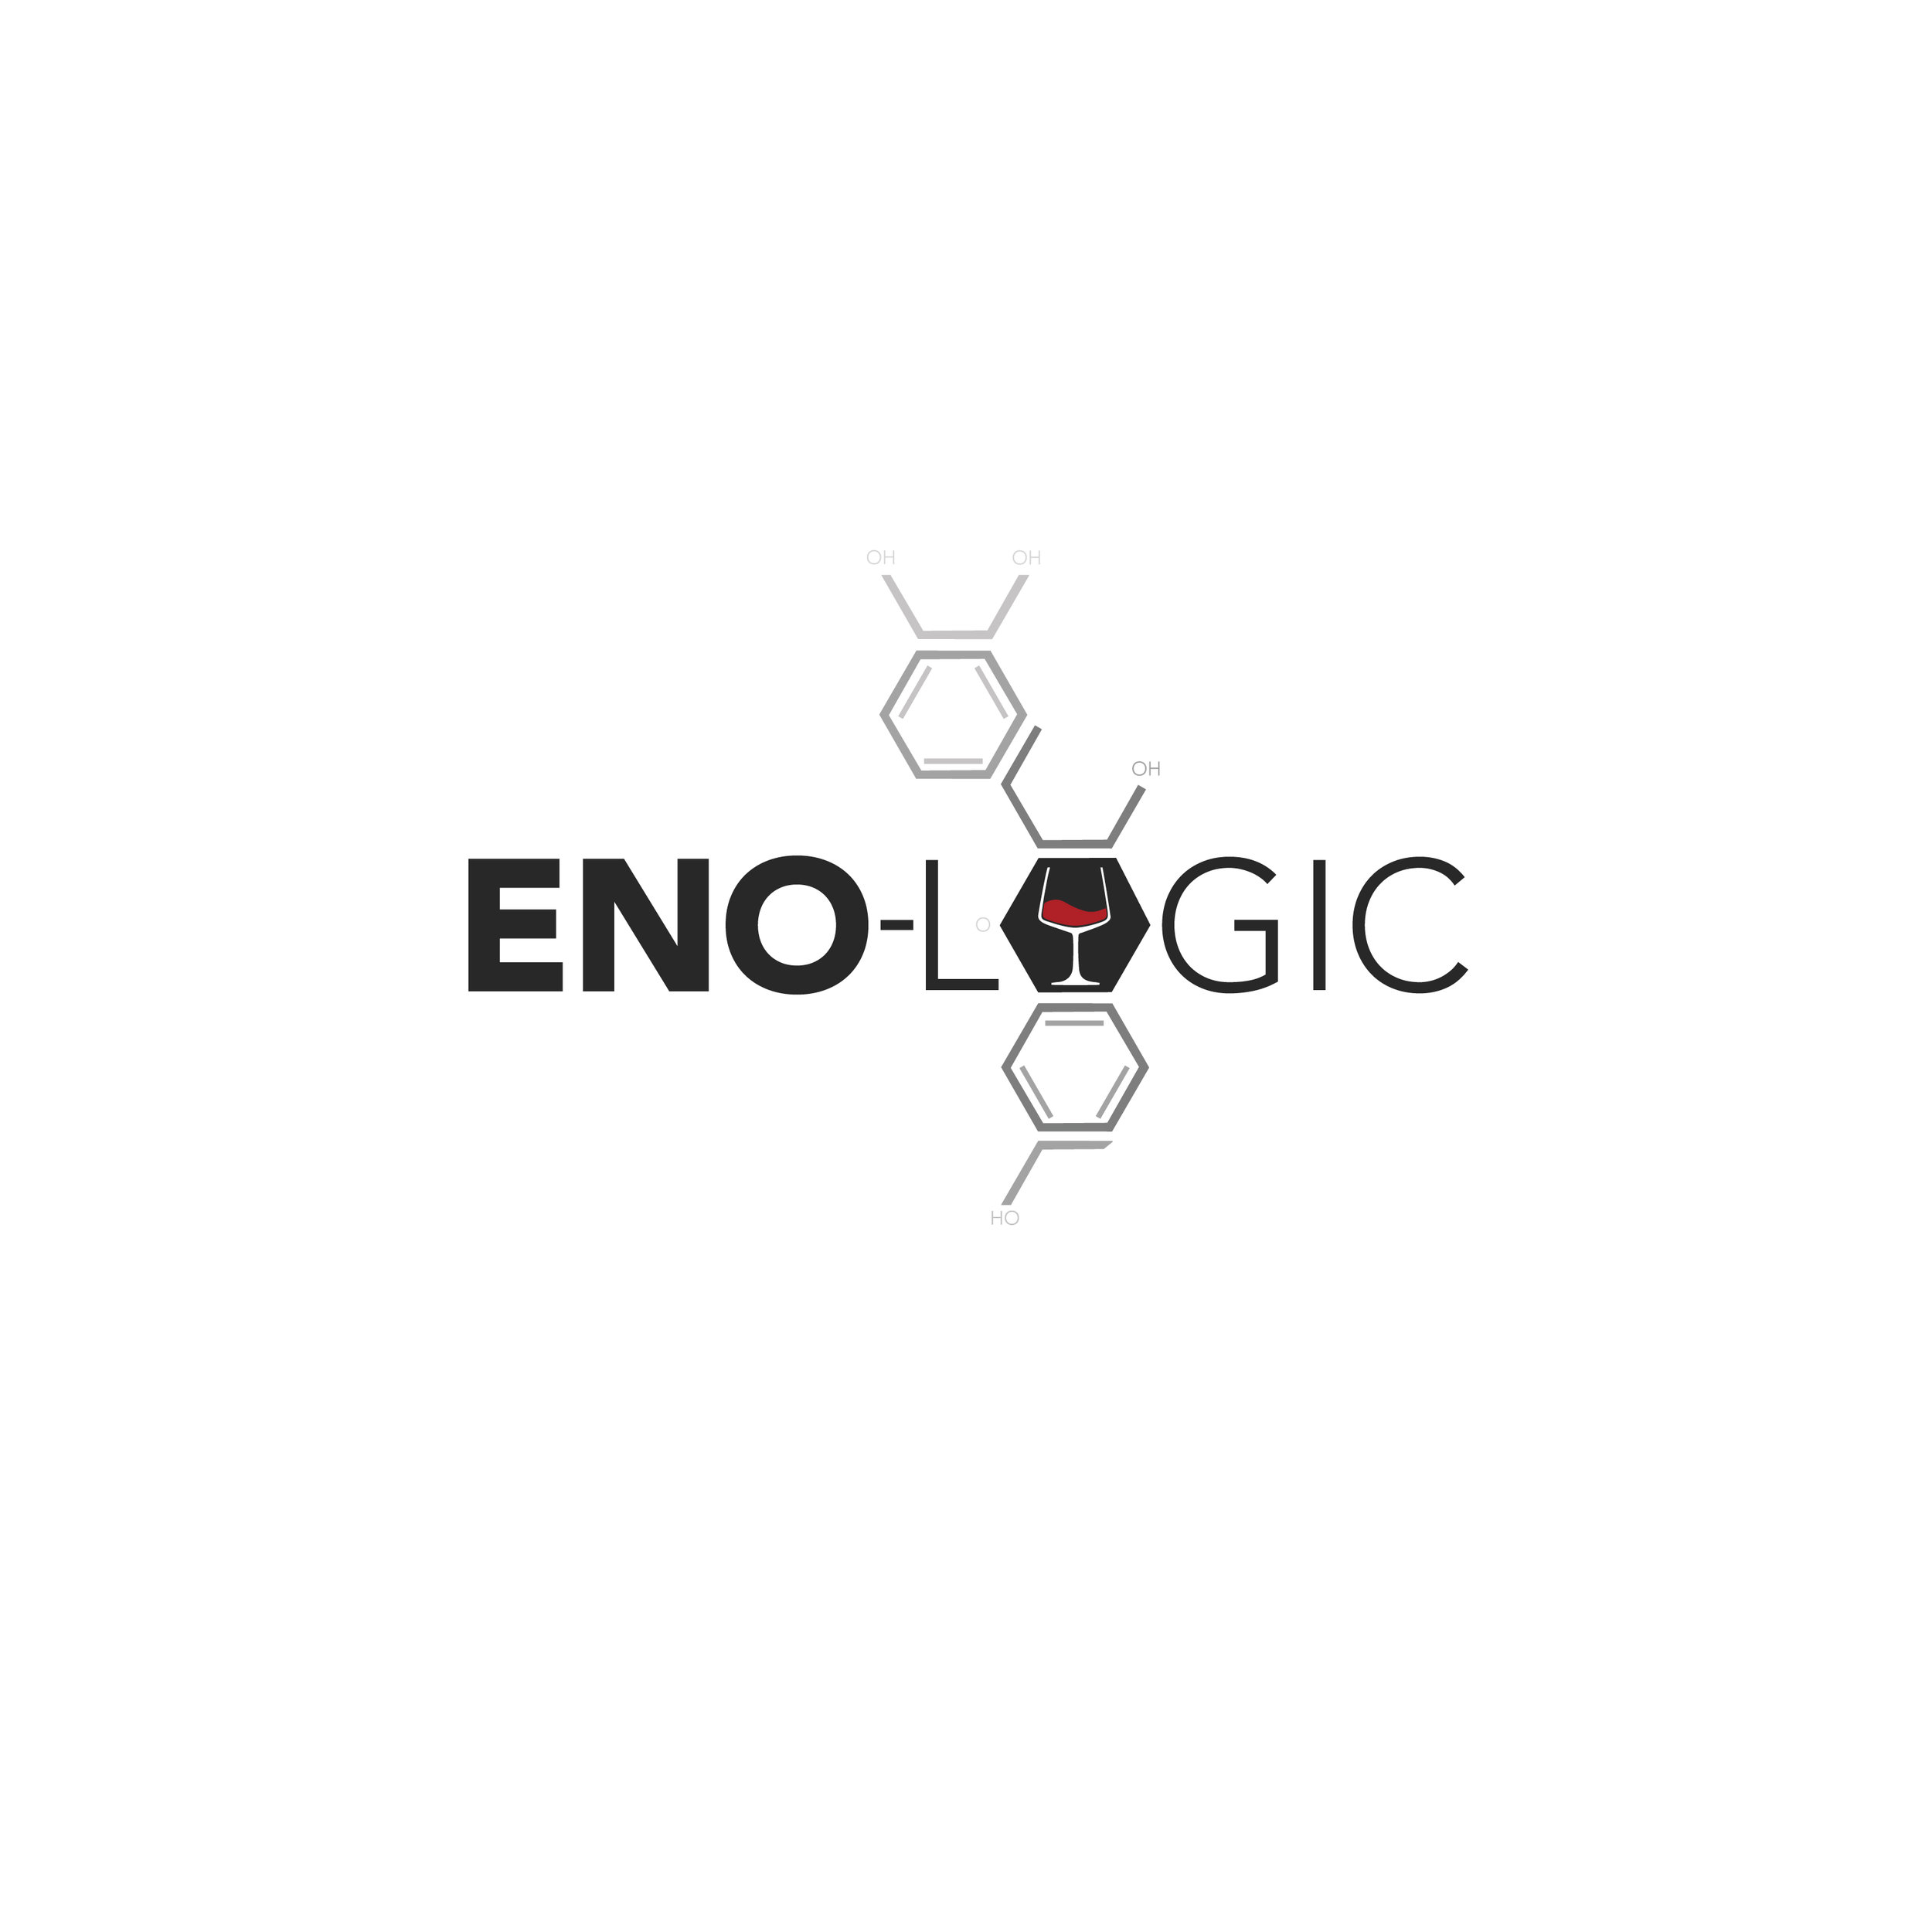 Eno-Logic